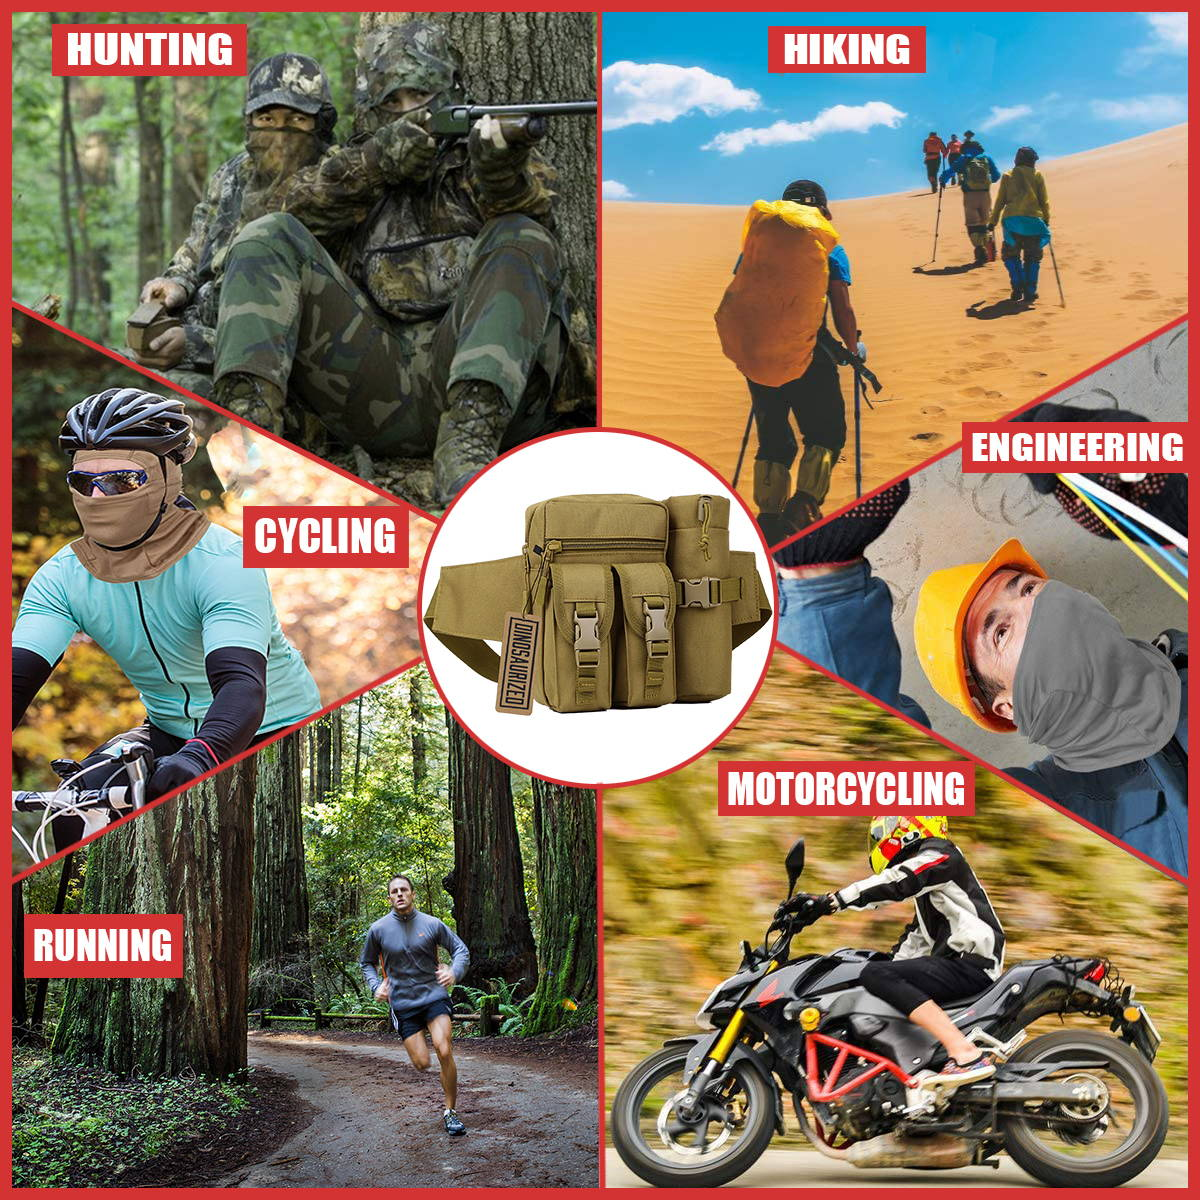 camping hunting gear